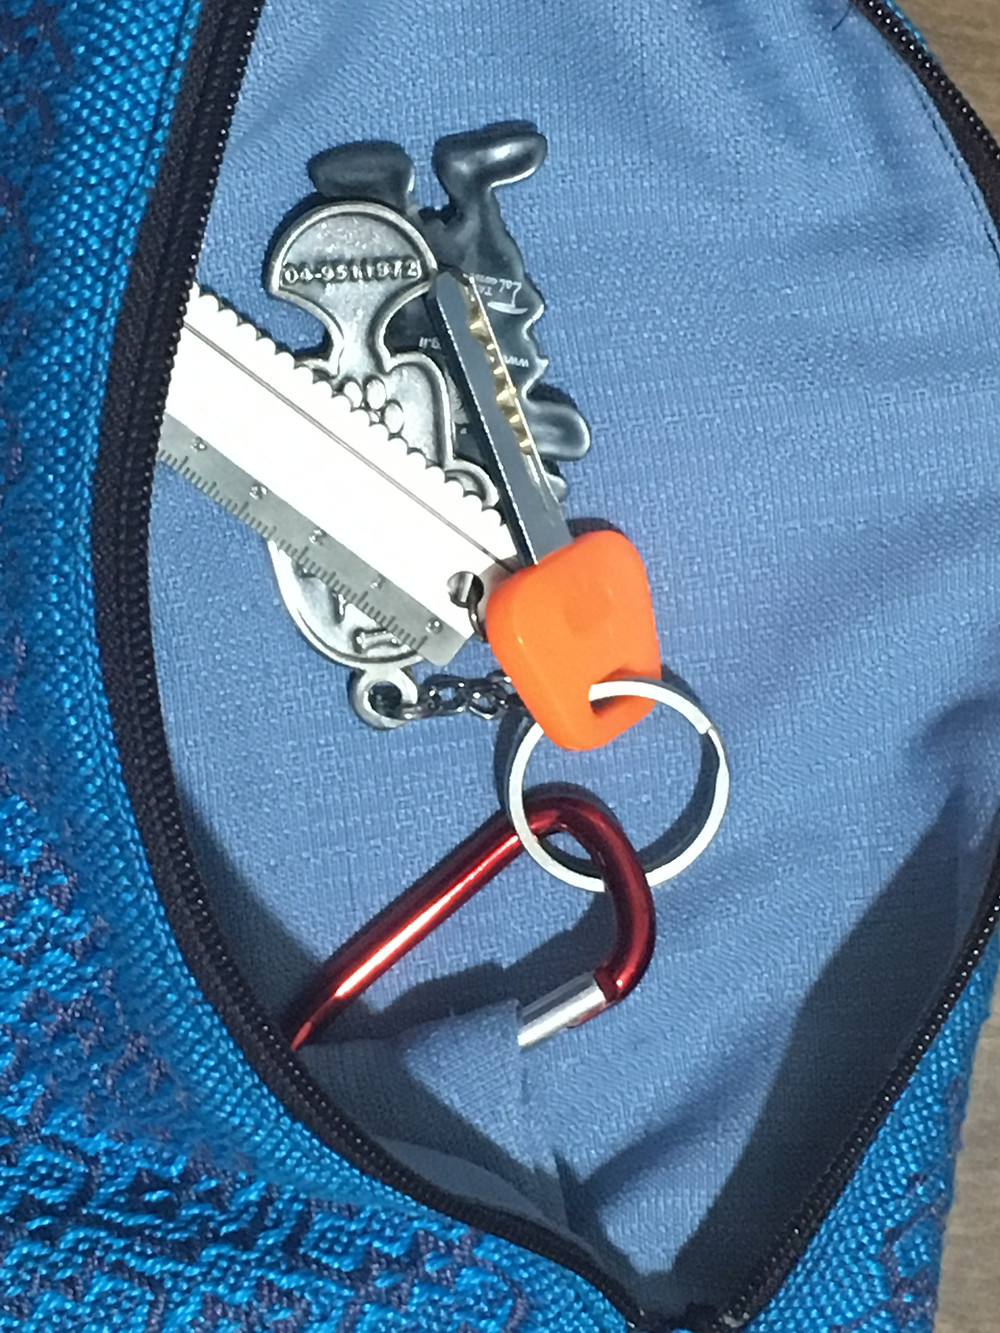 Carabiner clip keeps keys handy